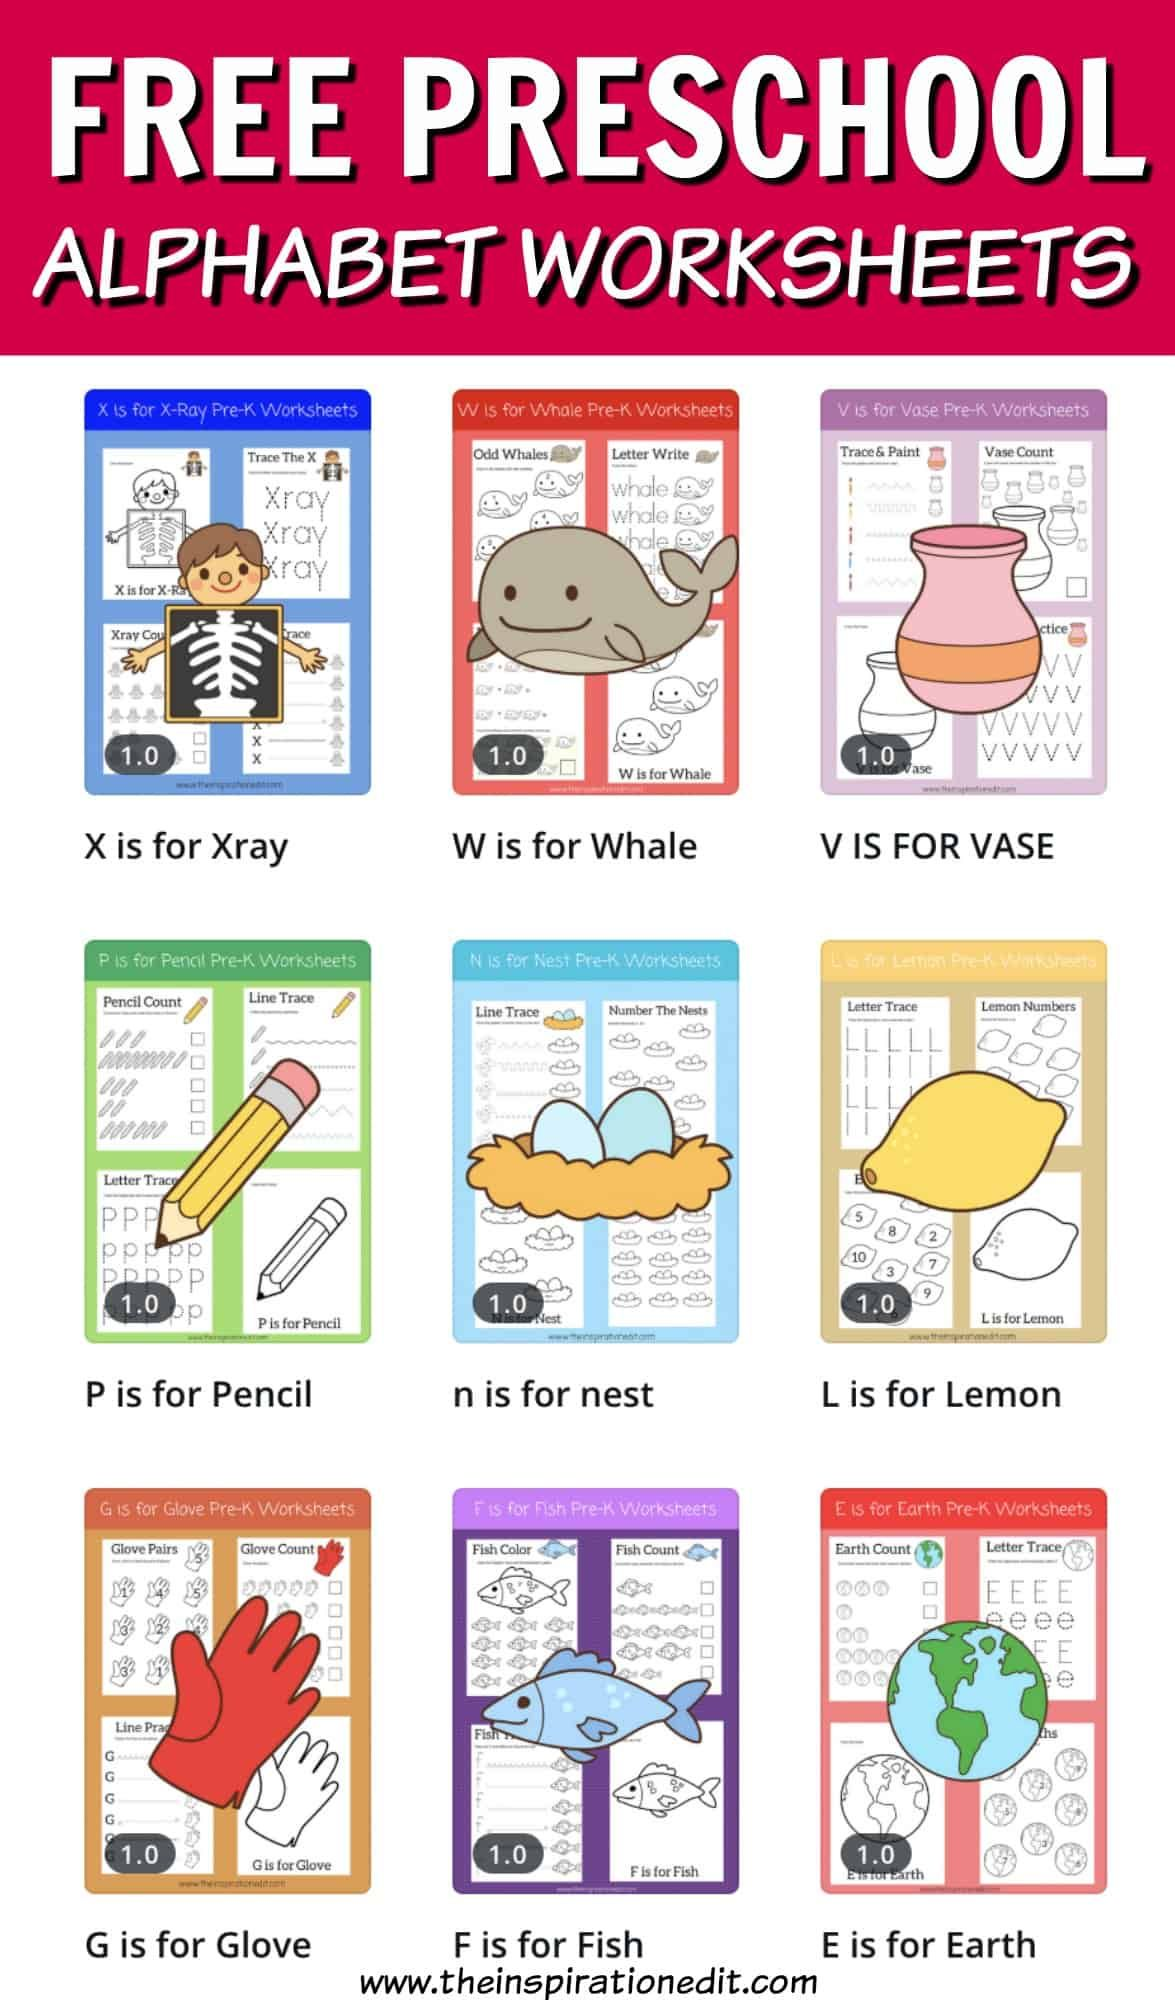 Letter R Worksheets For Preschool Kids Alphabet Worksheets Preschool Worksheets Alphabet Worksheets Preschool [ 2000 x 1175 Pixel ]